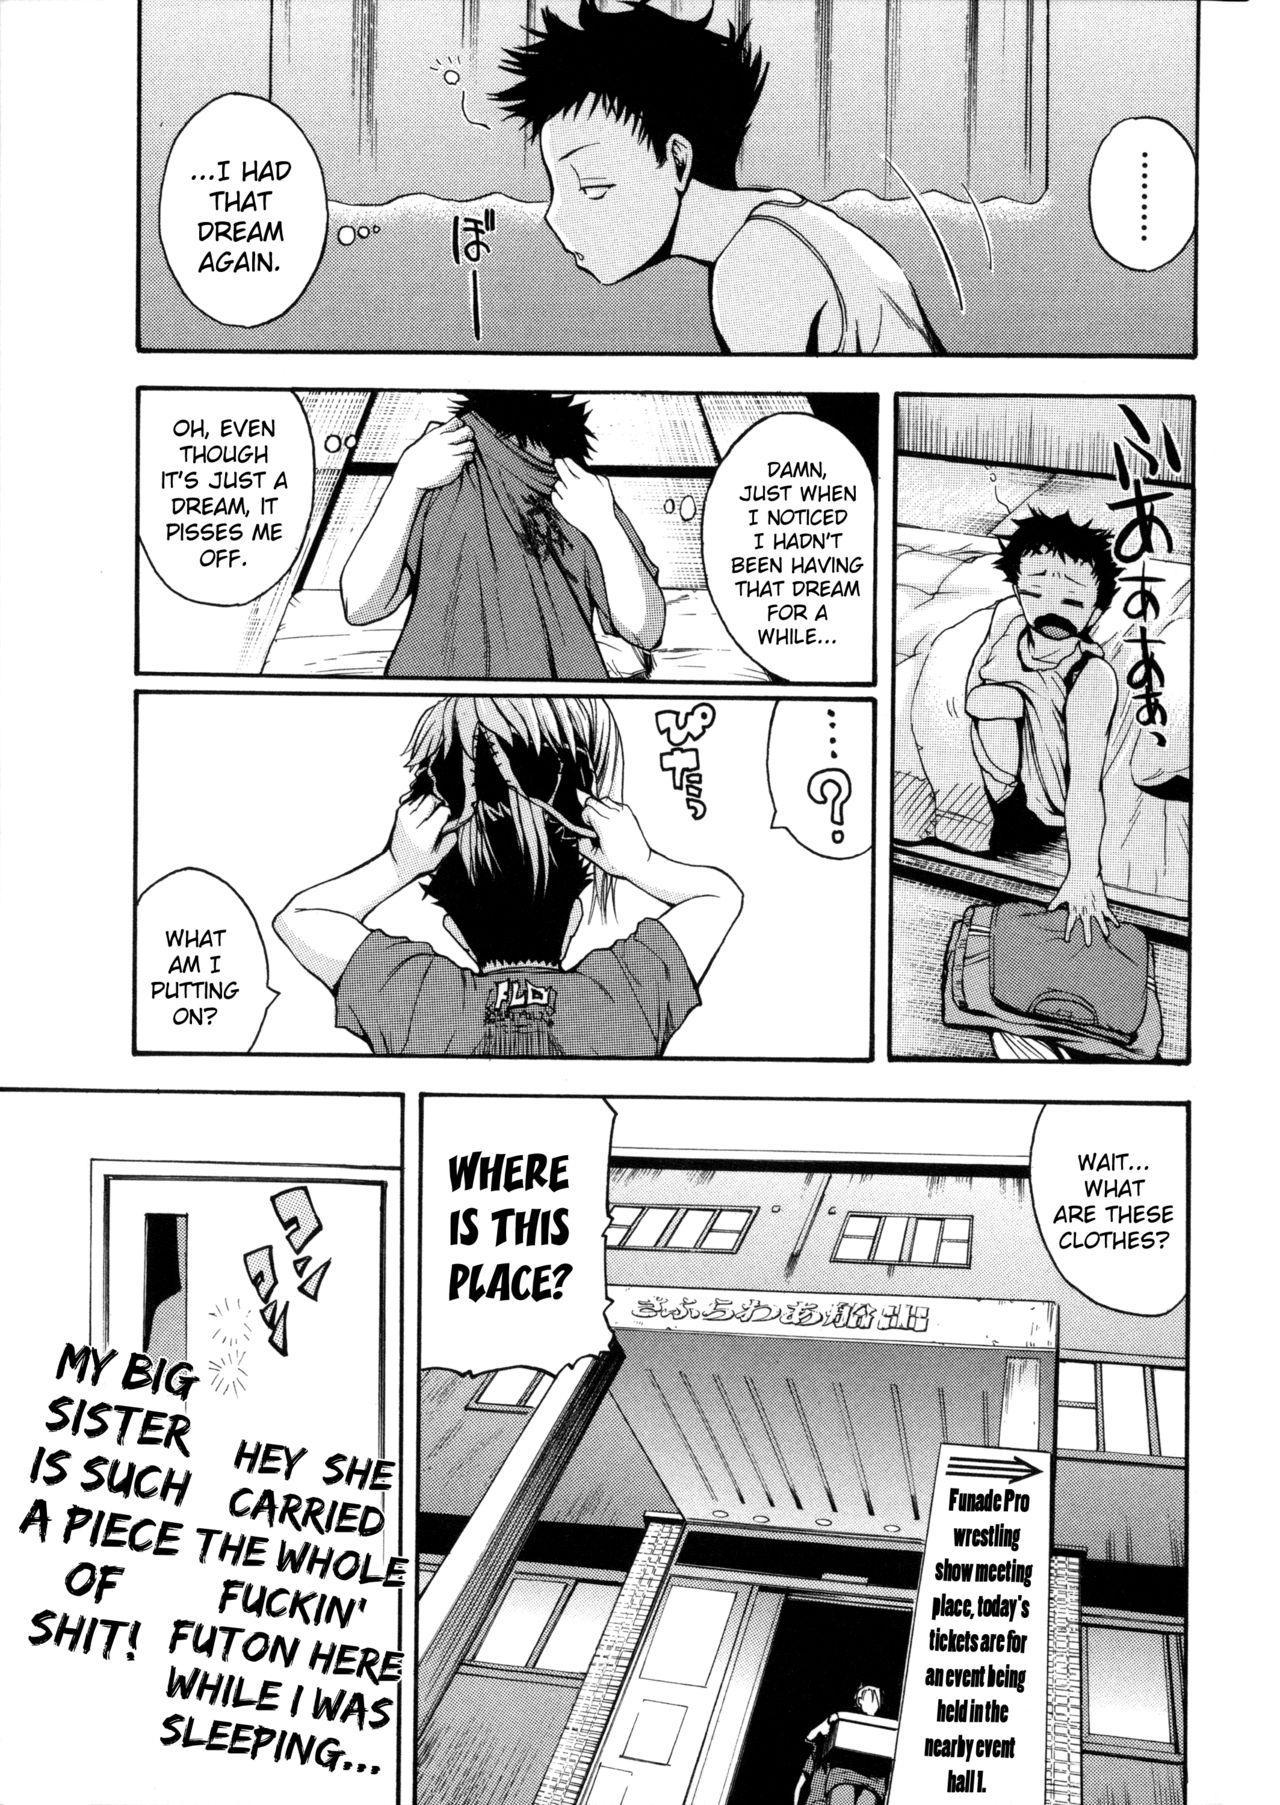 [Yoshimura Tatsumaki] Monzetsu Taigatame ~Count 3 de Ikasete Ageru~ | Faint in Agony Bodylock ~I'll make you cum on the count of 3~ [English] [Brolen] 75